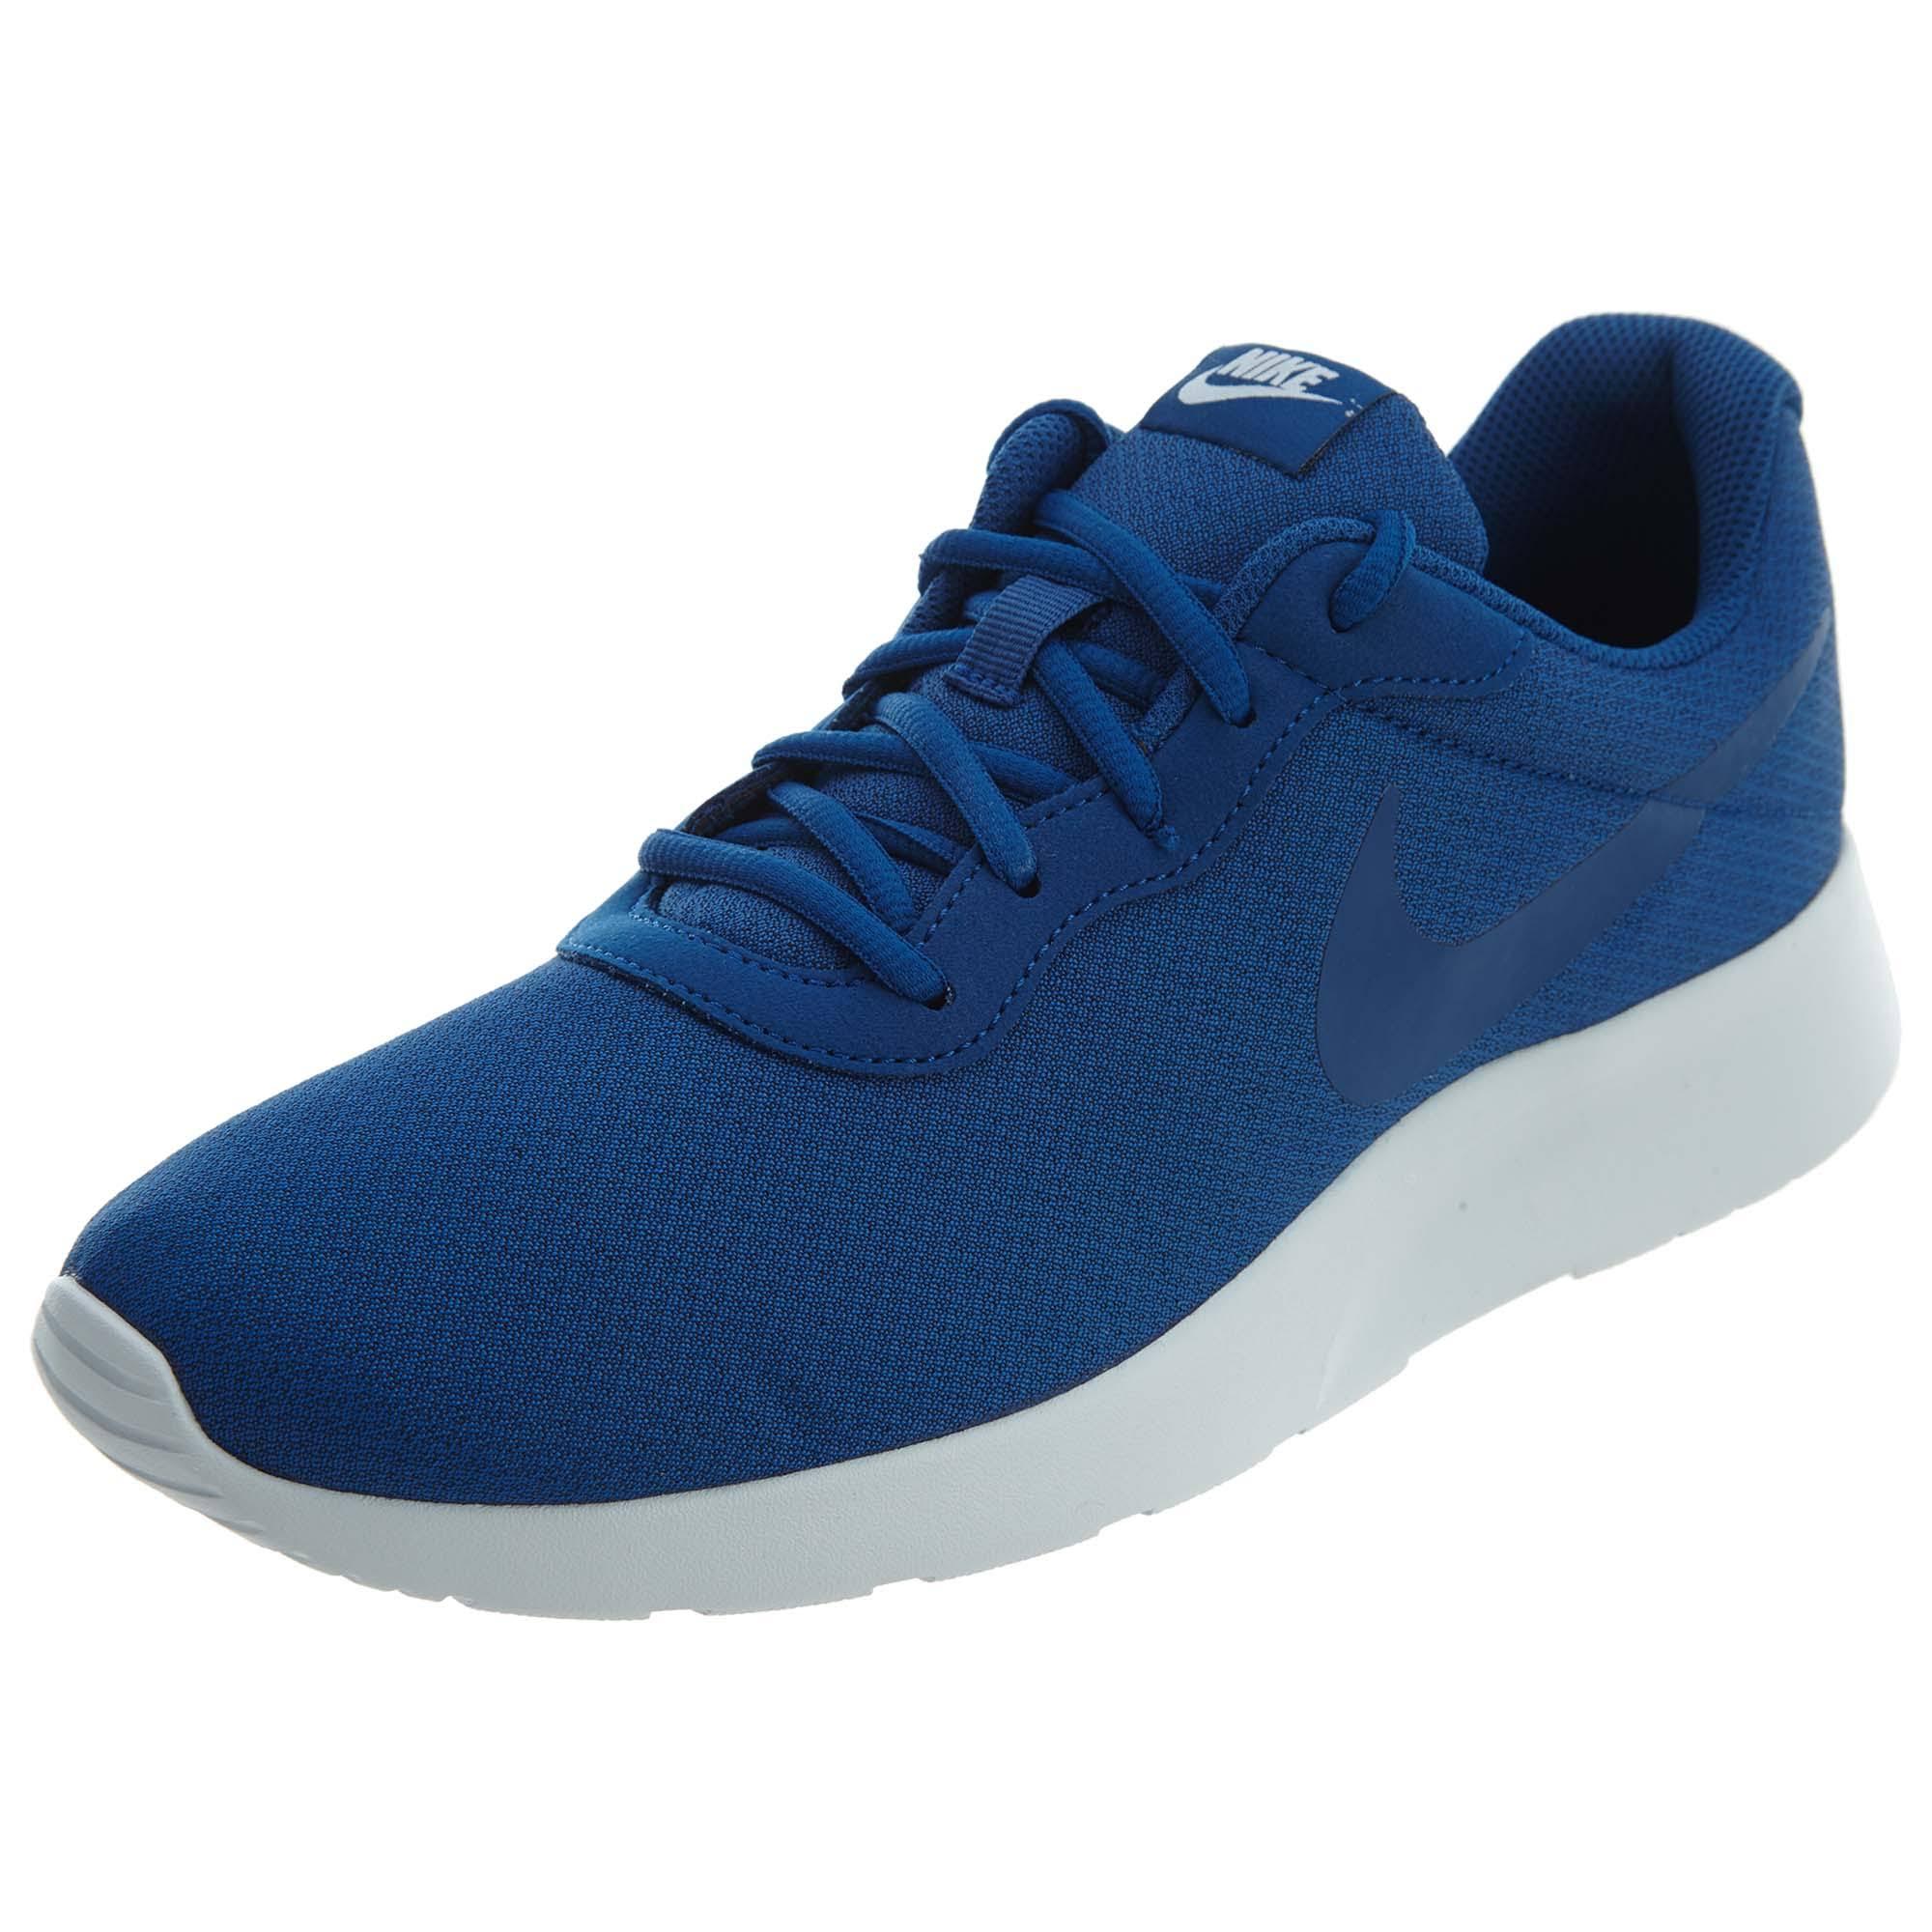 BluBianco Us Style812654 Tanjun Taglia M Nike 403 12 Mens fgvb6yIY7